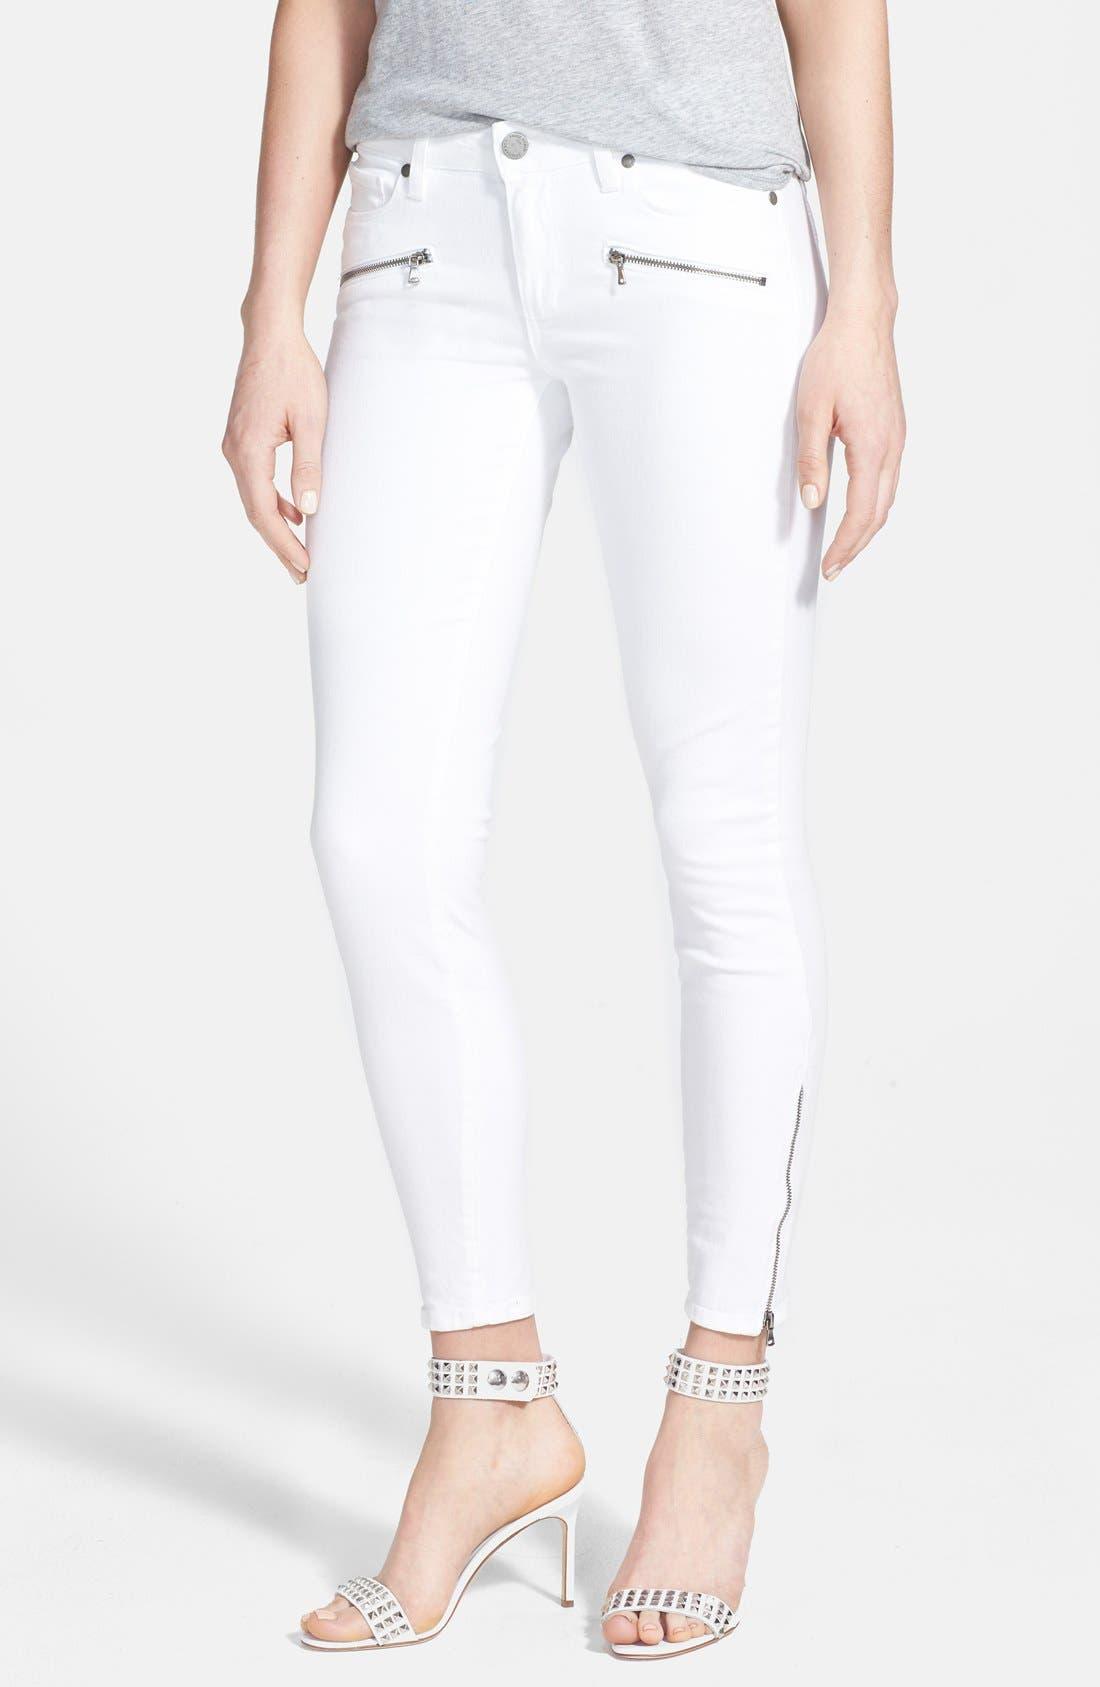 Alternate Image 1 Selected - Paige Denim 'Jane' Zip Detail Ultra Skinny Jeans (Optic White)